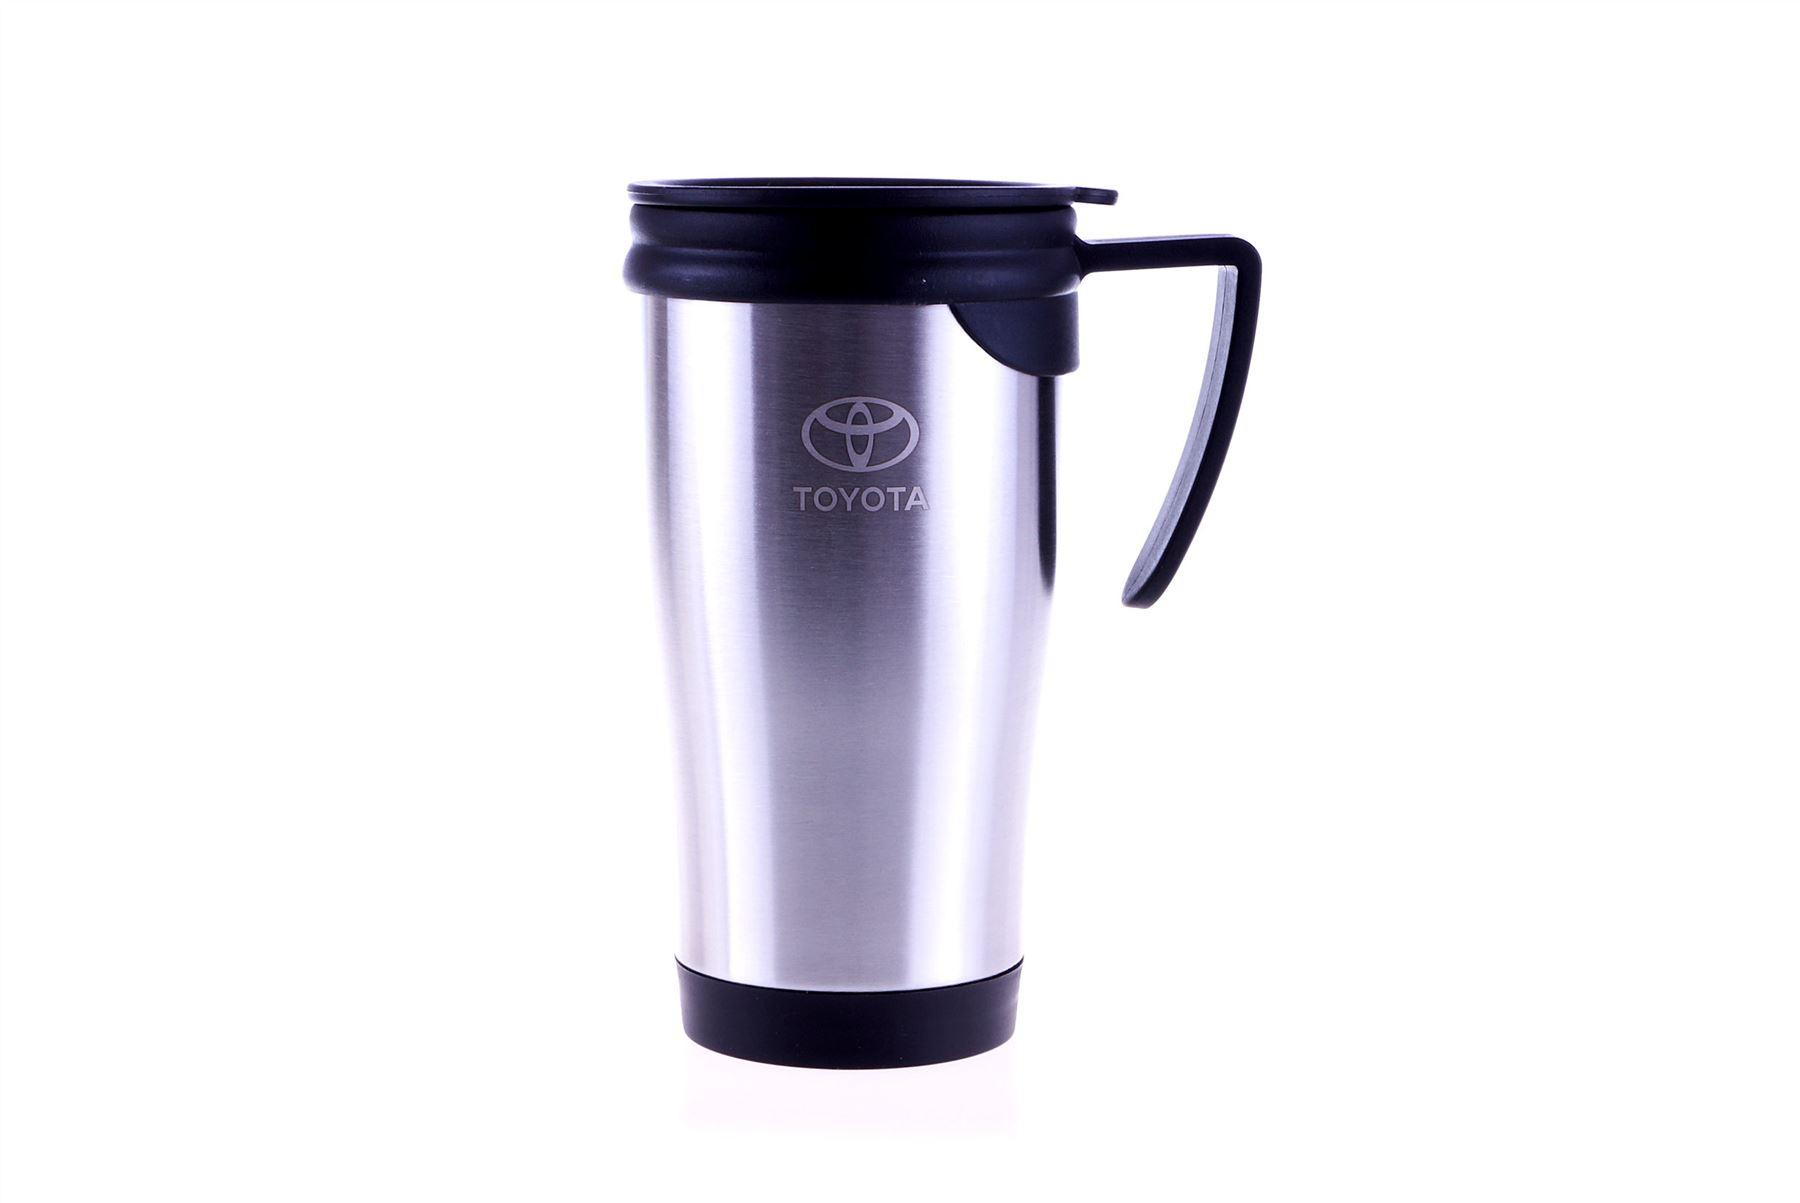 Genuine toyota 450ml stainless steel travel coffee cup mug - Travel mug stainless steel interior ...